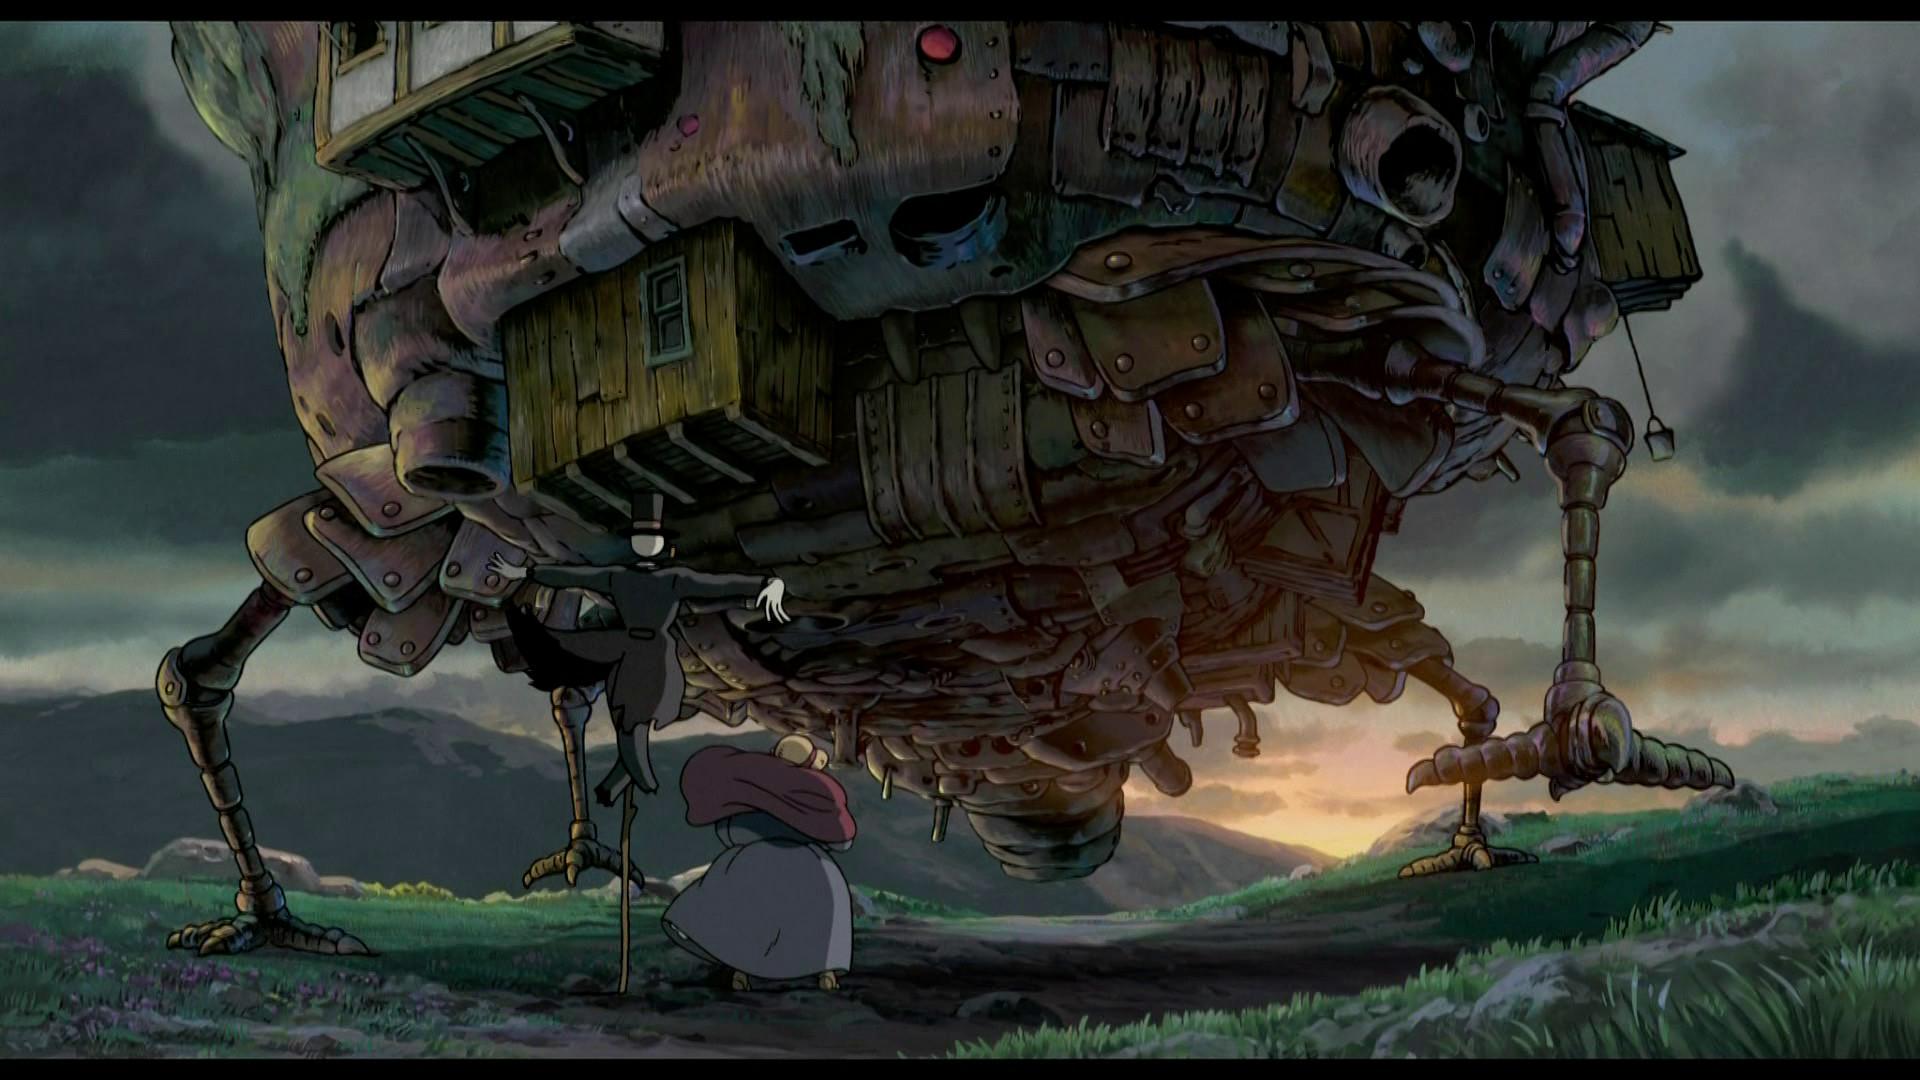 Movie – Howl's Moving Castle Wallpaper